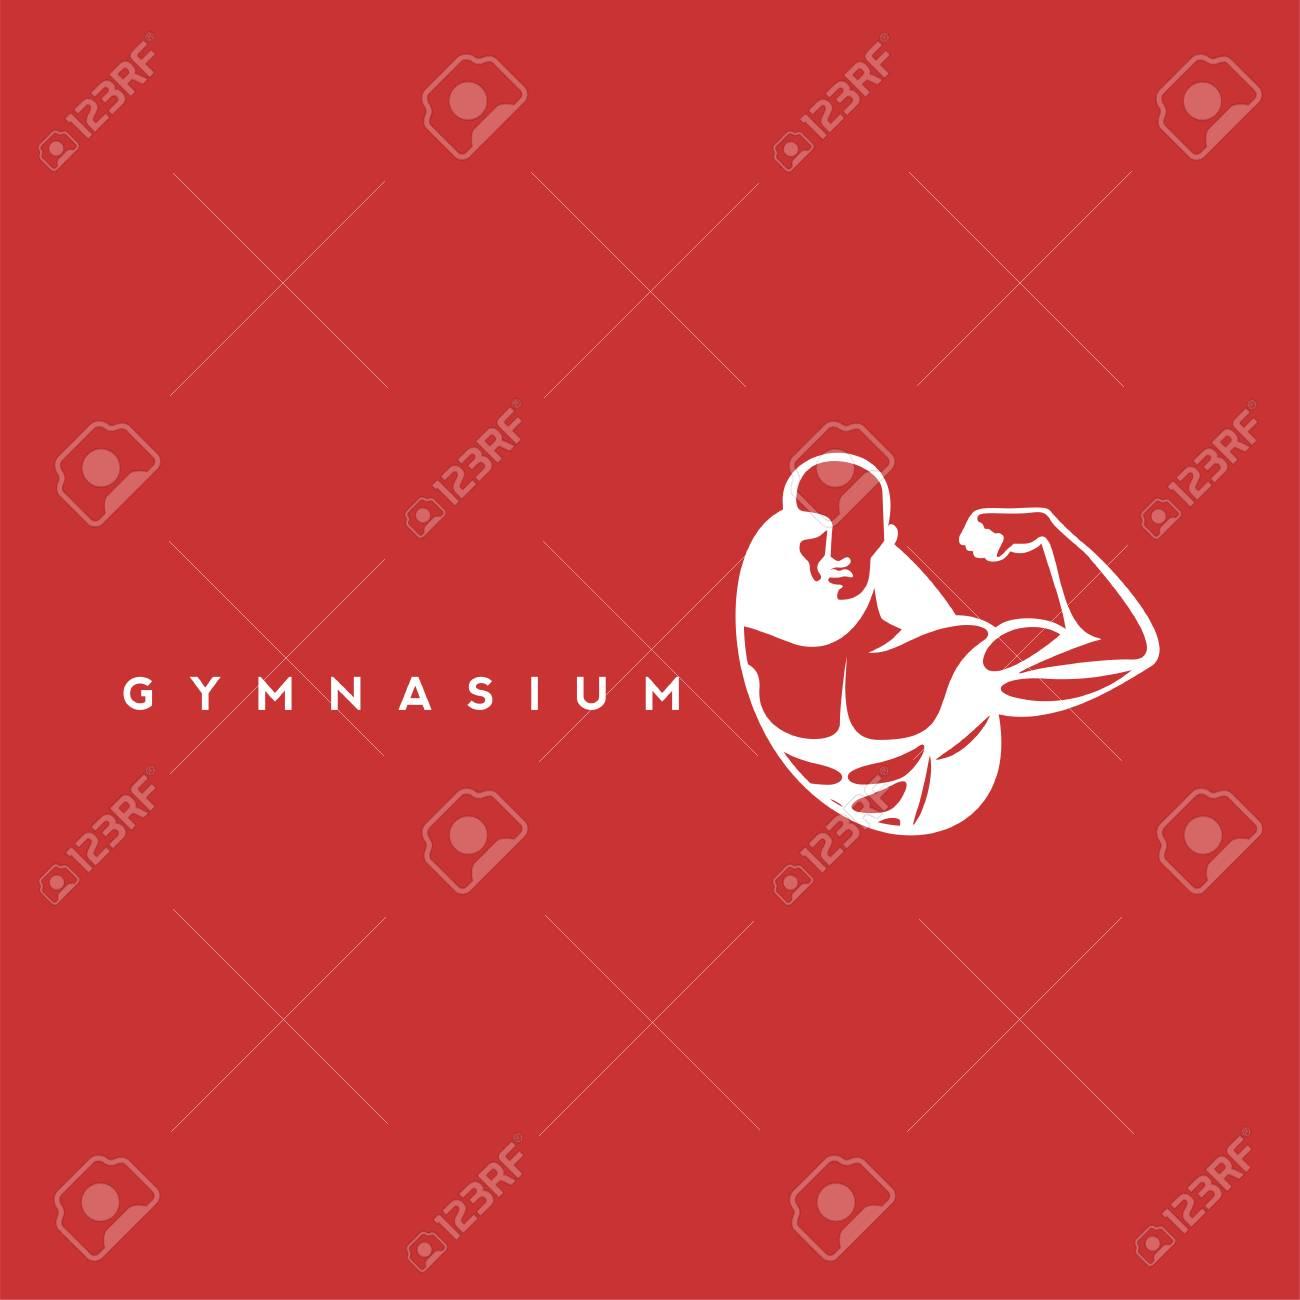 White gymnasium icon vector illustration. - 95226136